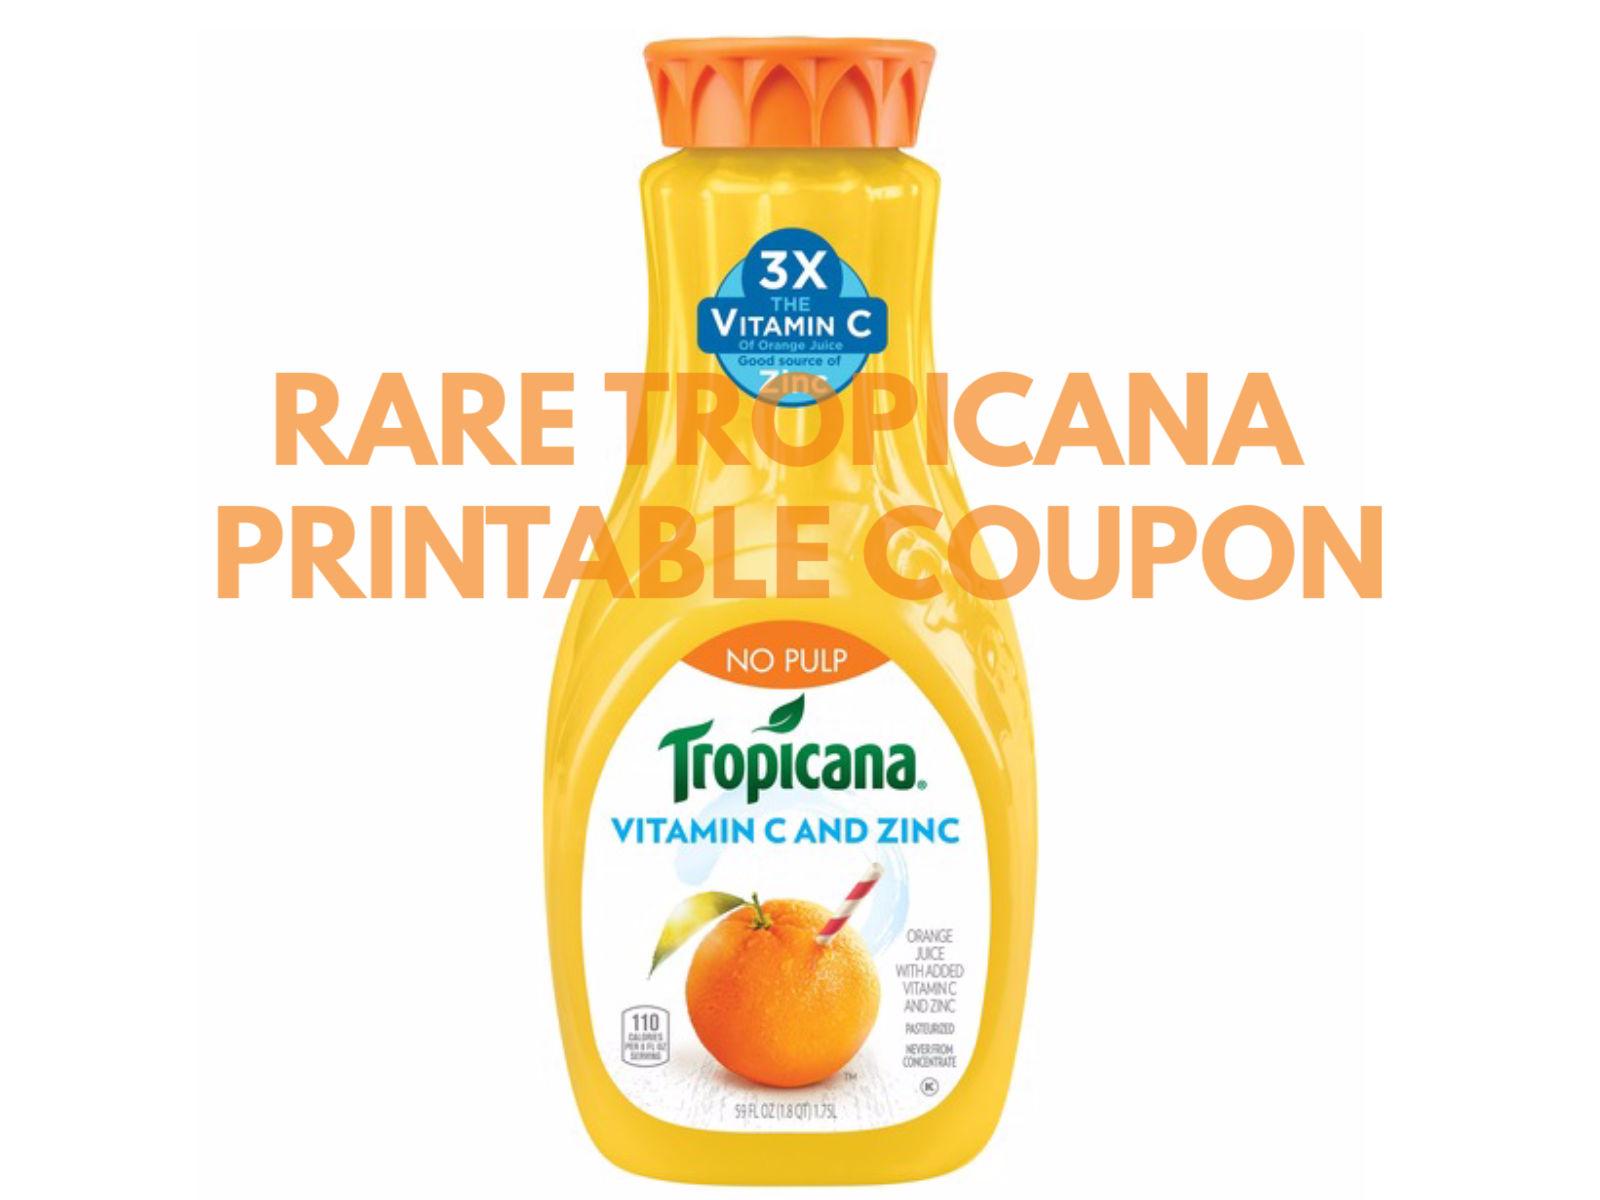 New Tropicana Orange Juice Coupon To Print on I Heart Publix